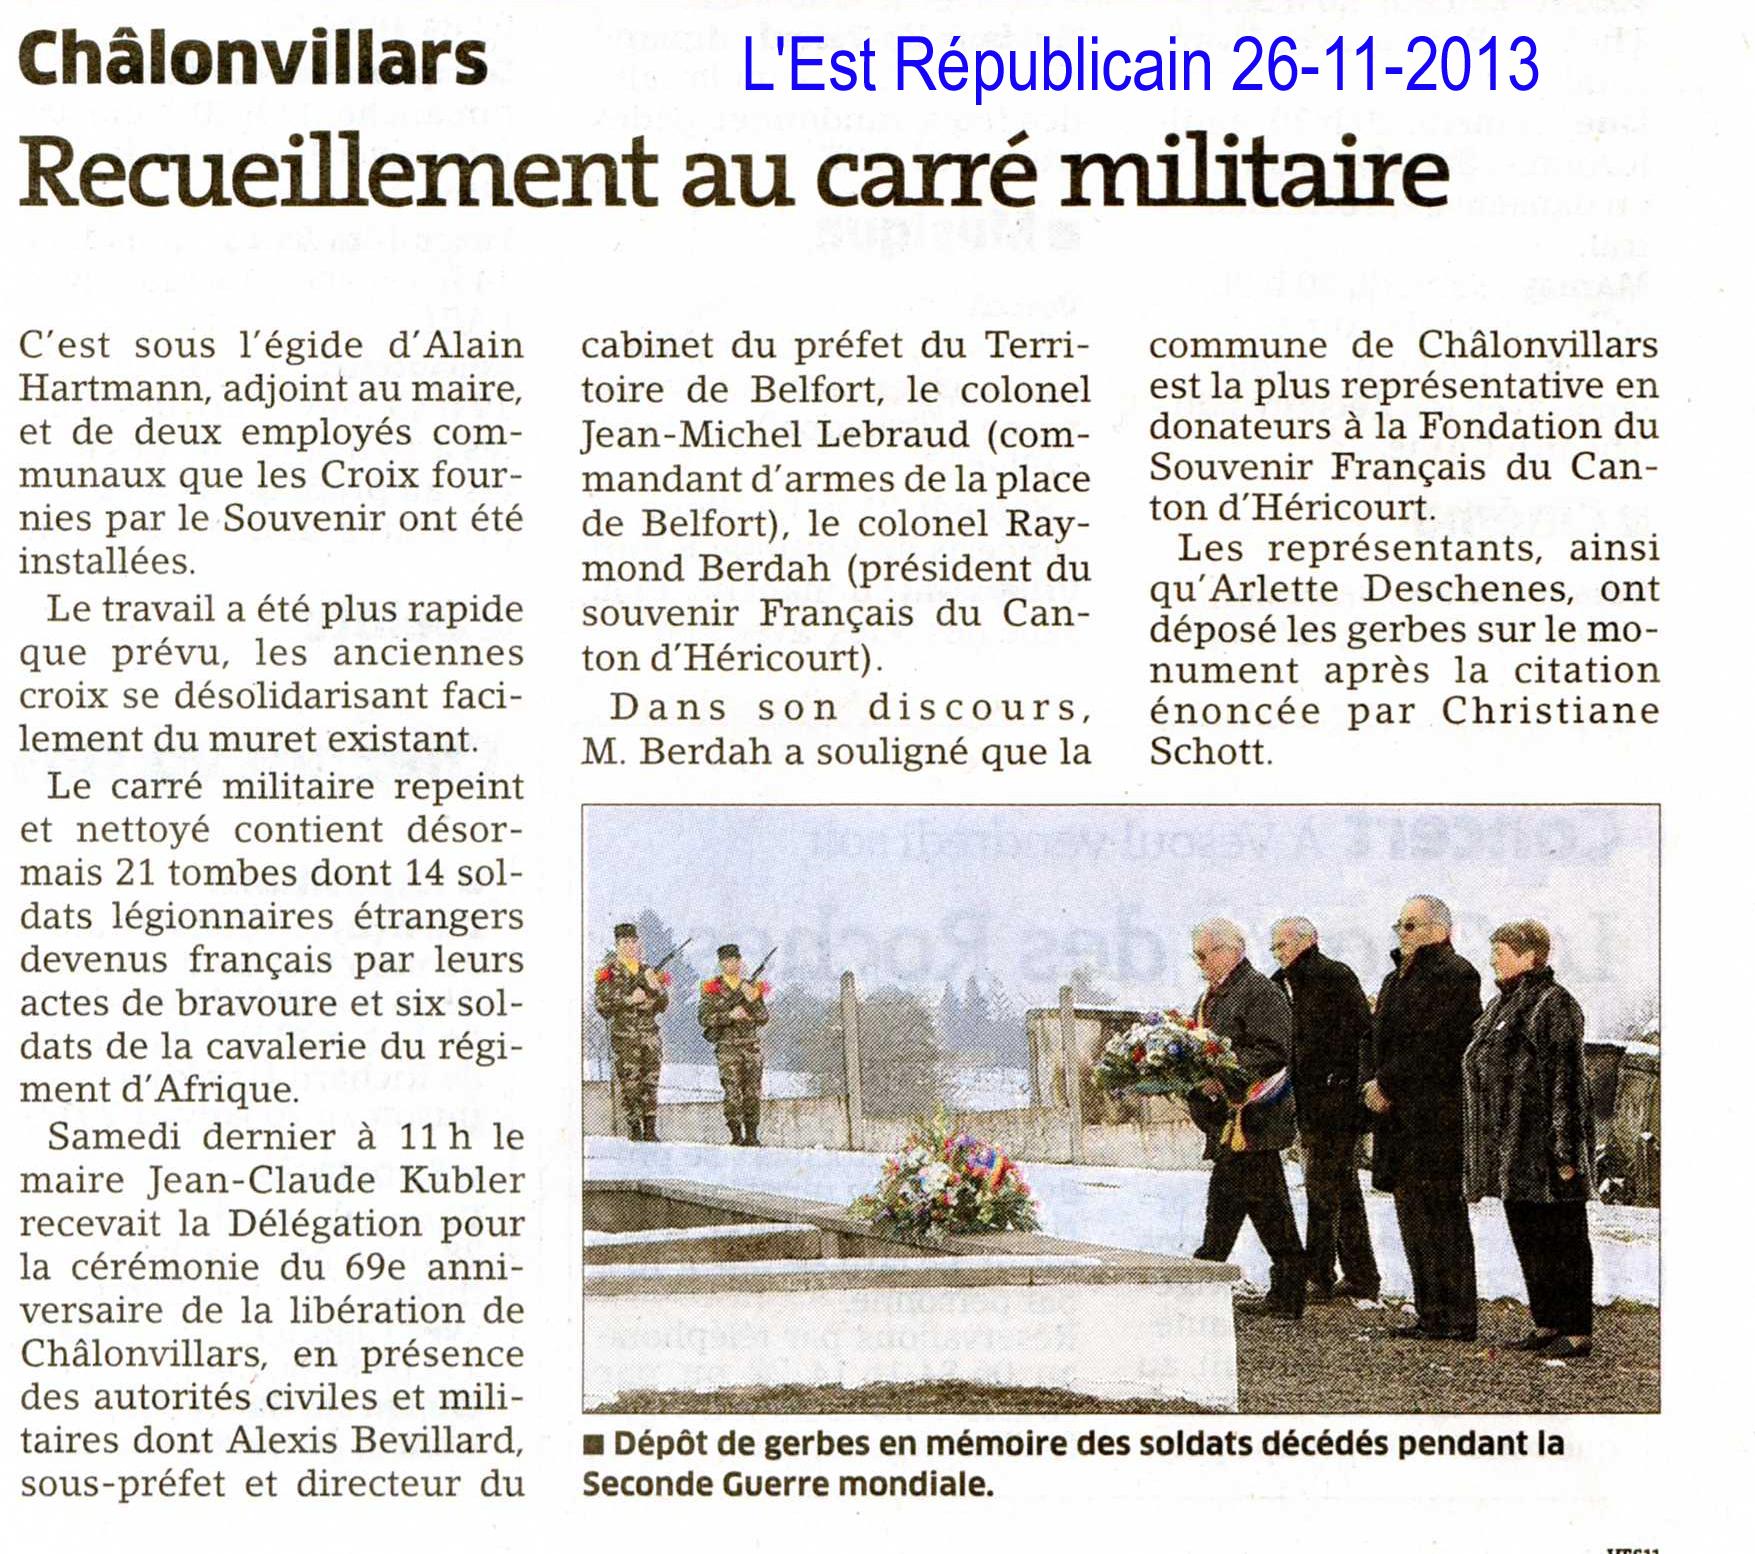 2013 11 26 l est republicain liberation chalonvillars